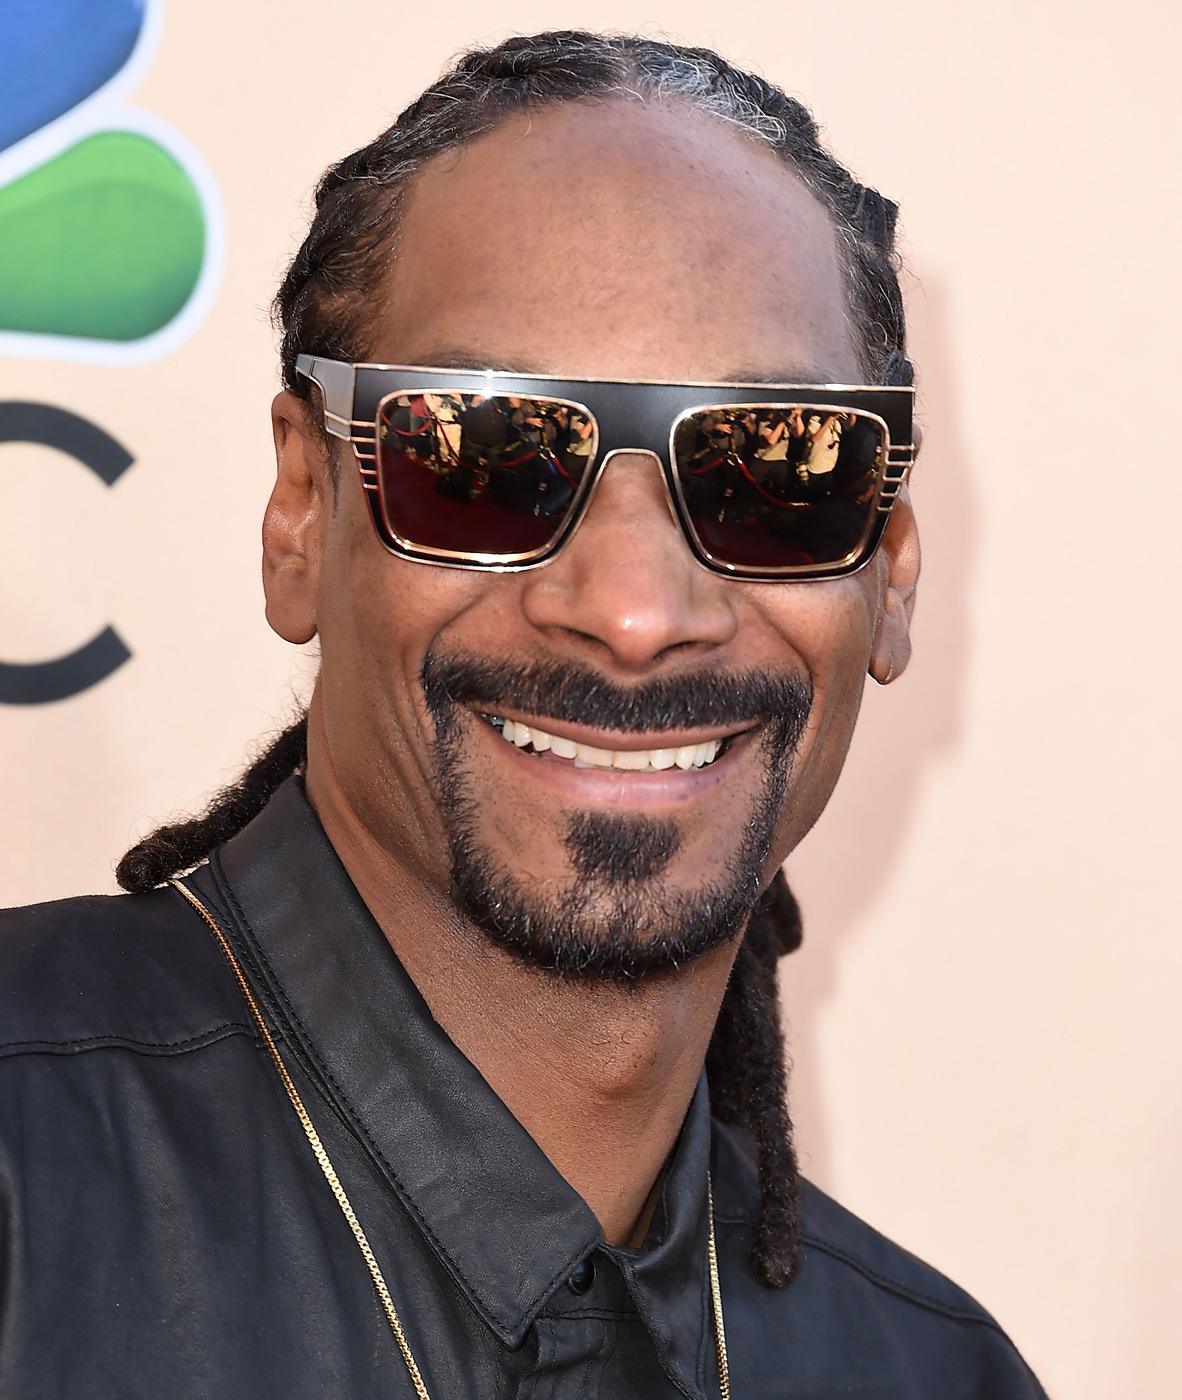 Snoop Dogg Net Worth 2018 | How They Made It, Bio, Zodiac